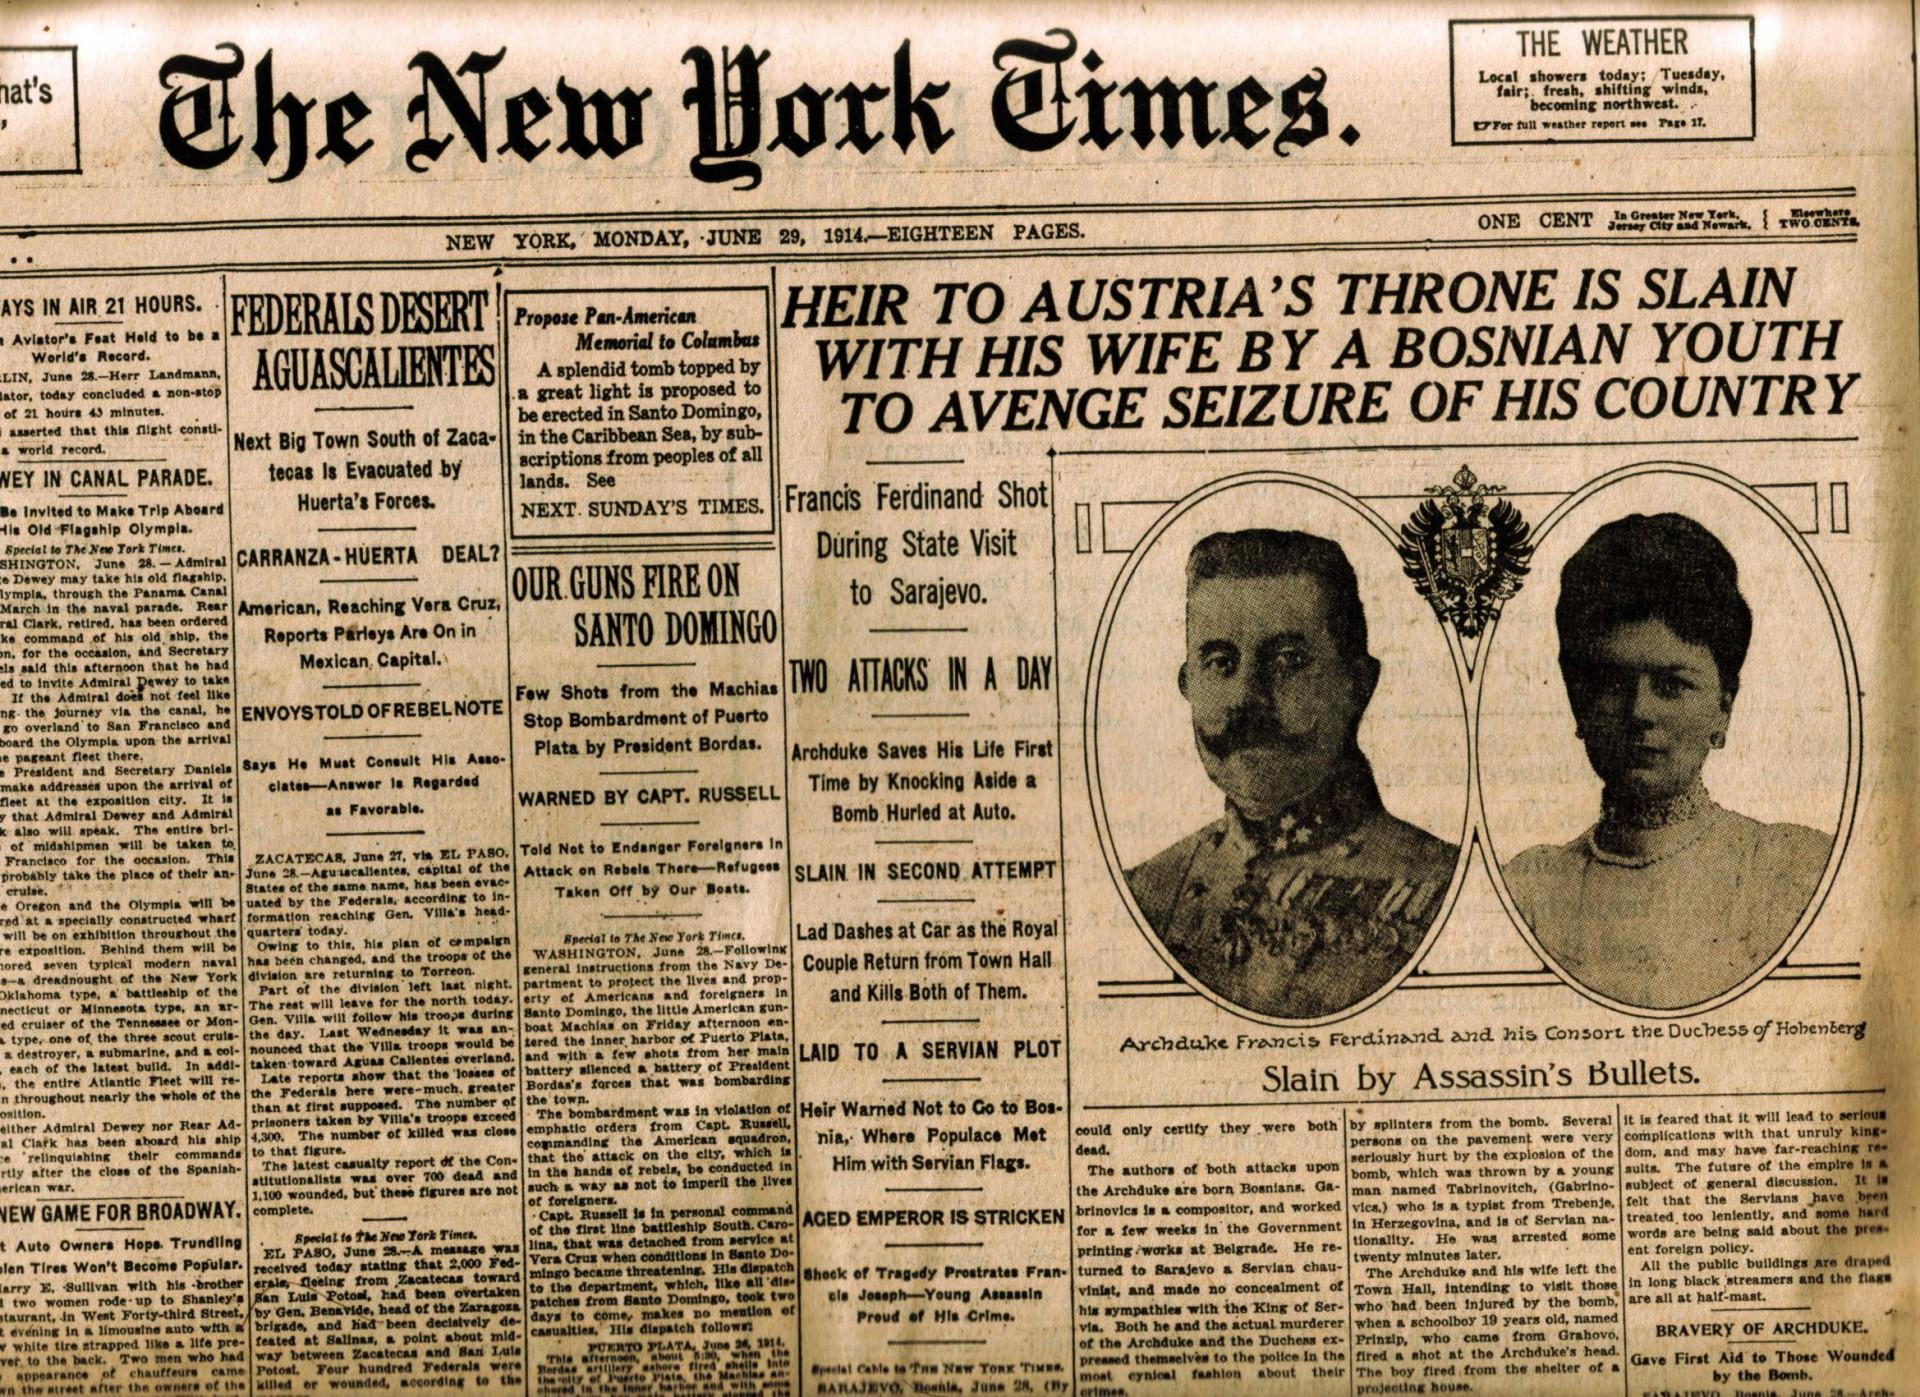 0054-01 NYT Headline June 29th 1914